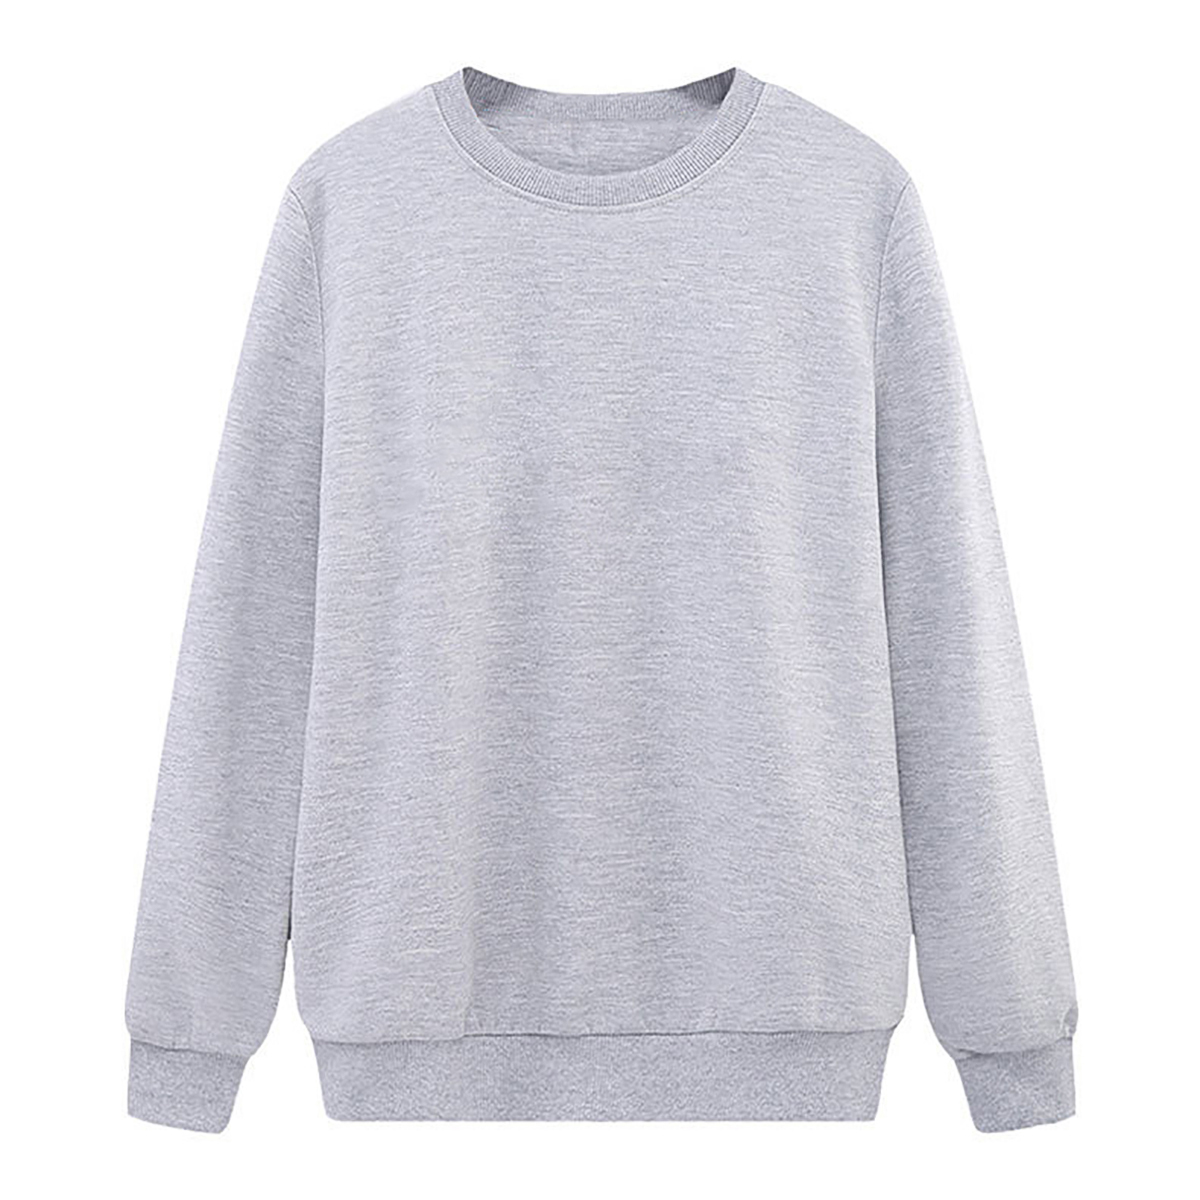 Solid Color Sweatshirt Women Casual Hoodie Fashion Winter Autumn Ladies Pullover Fleece Black White Blue Red Gray Streetwear